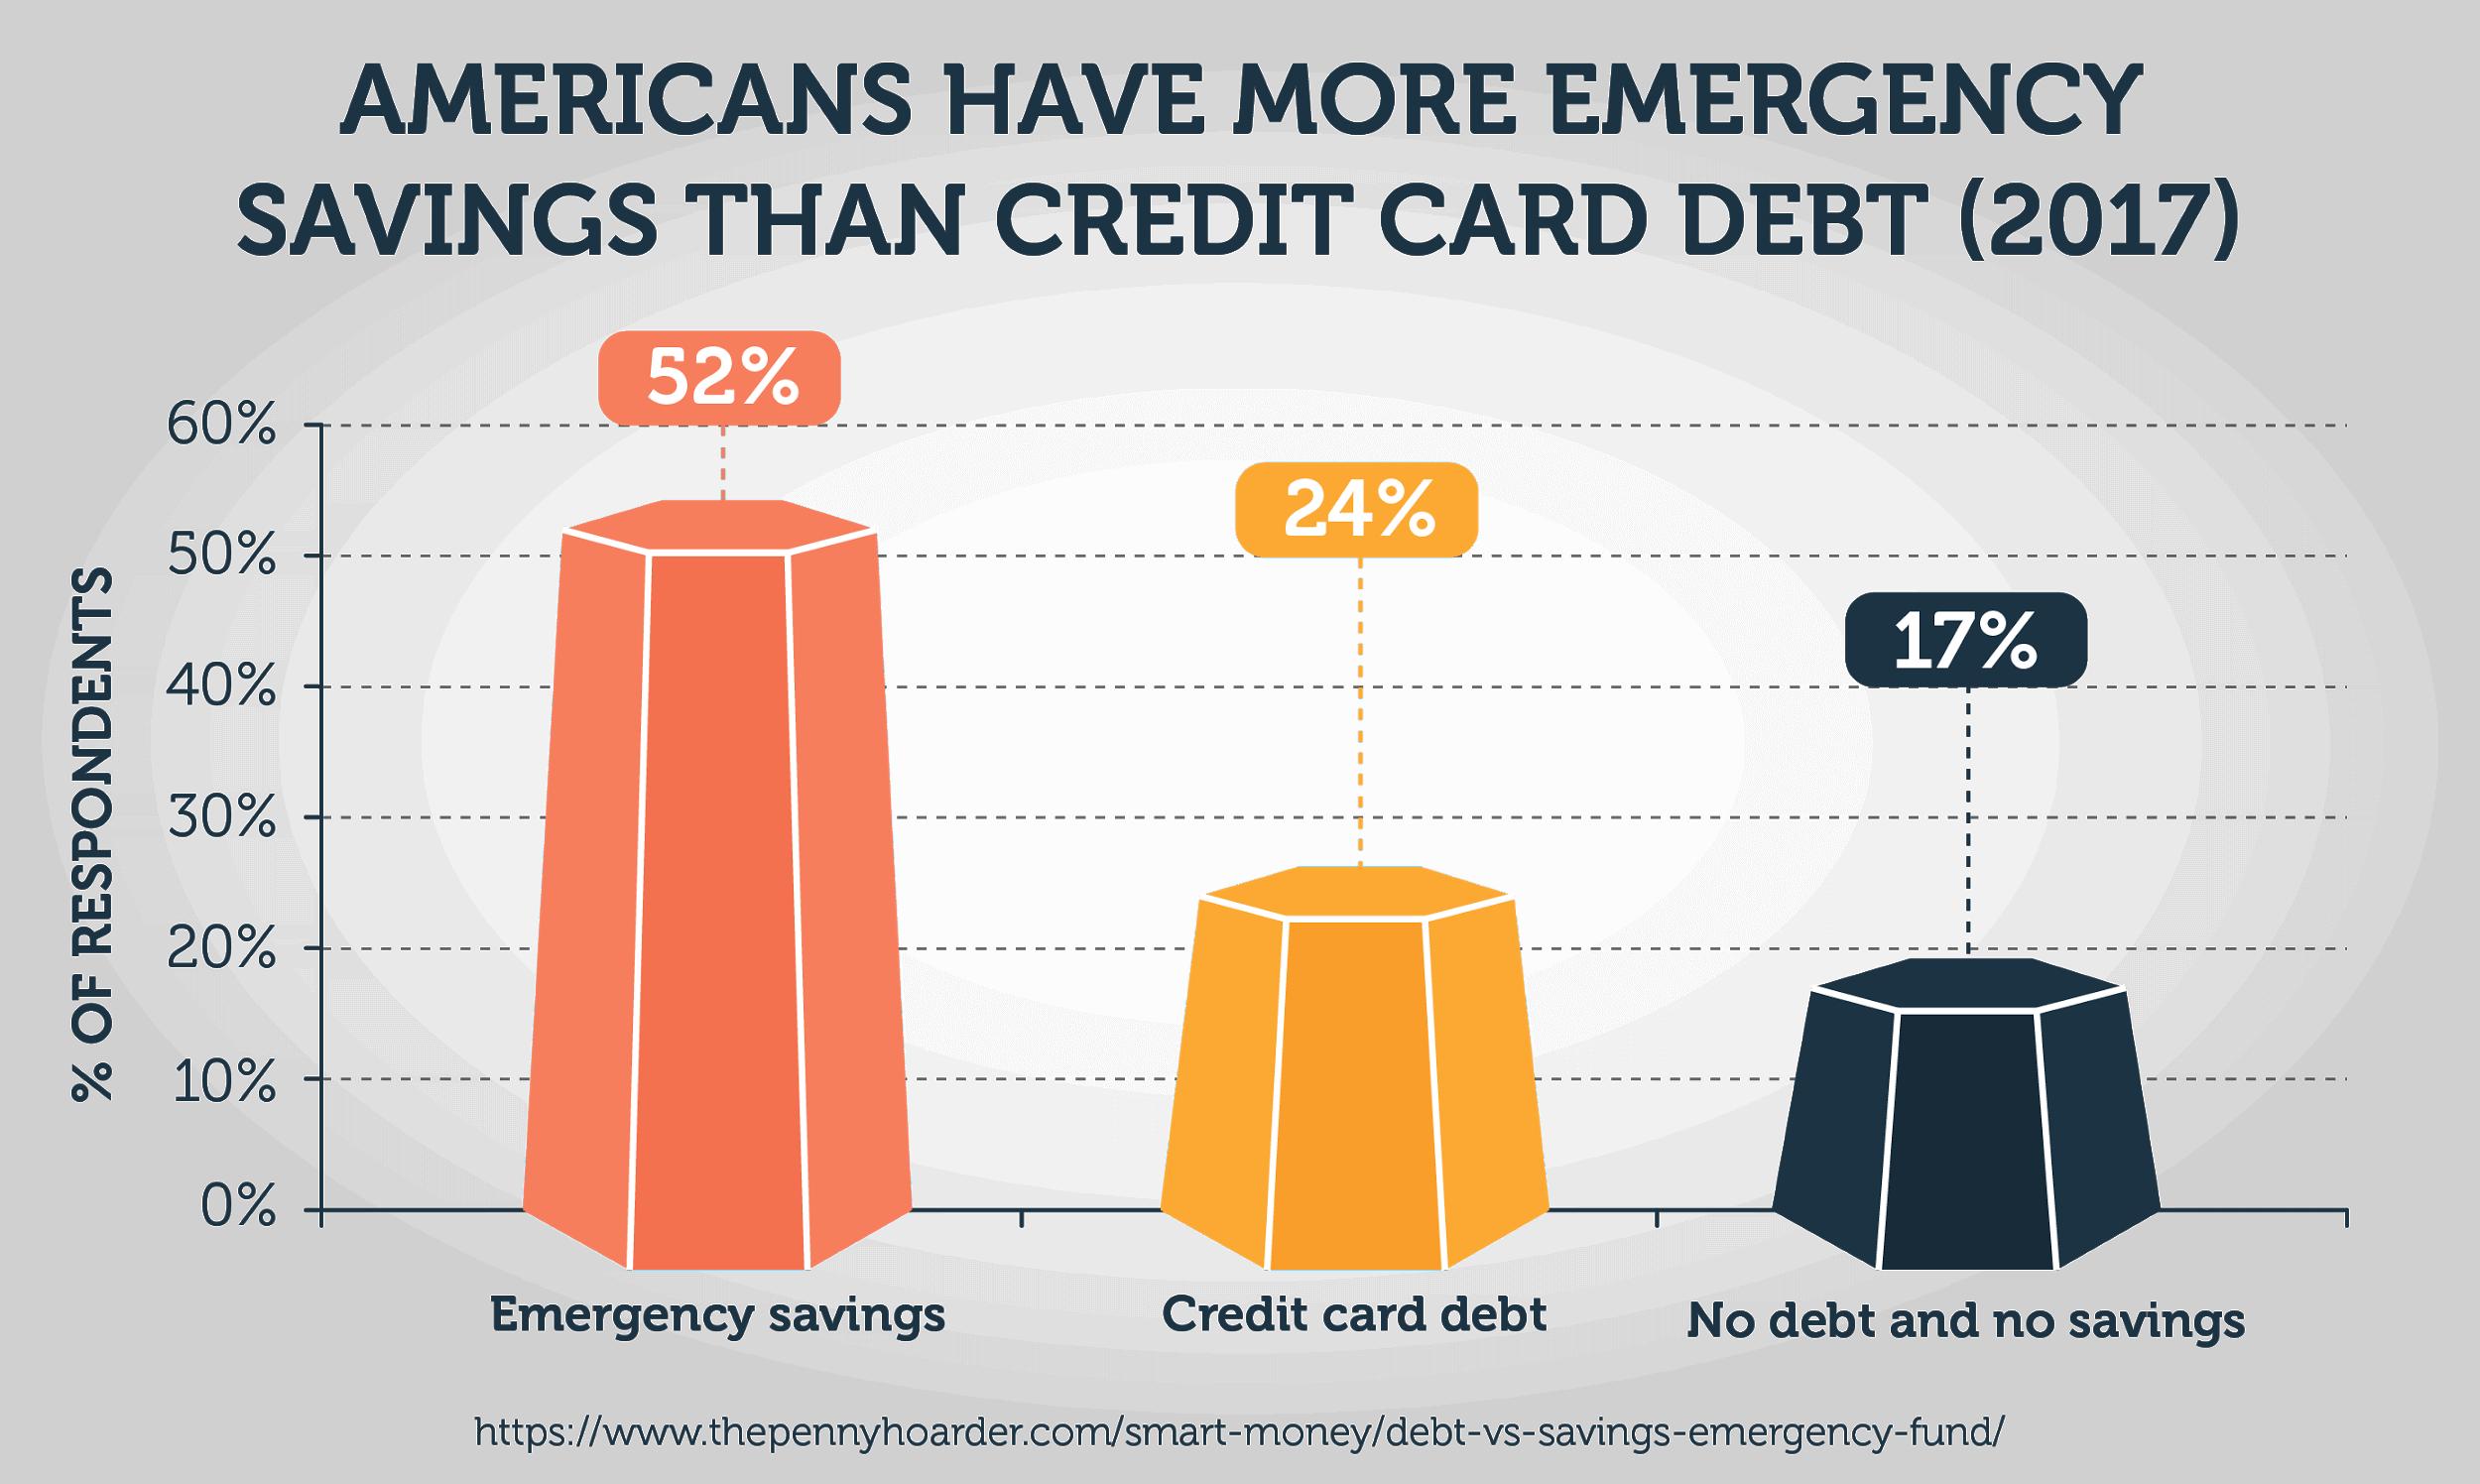 Americans Have More Emergency Savings Than Credit Card Debt (2017)